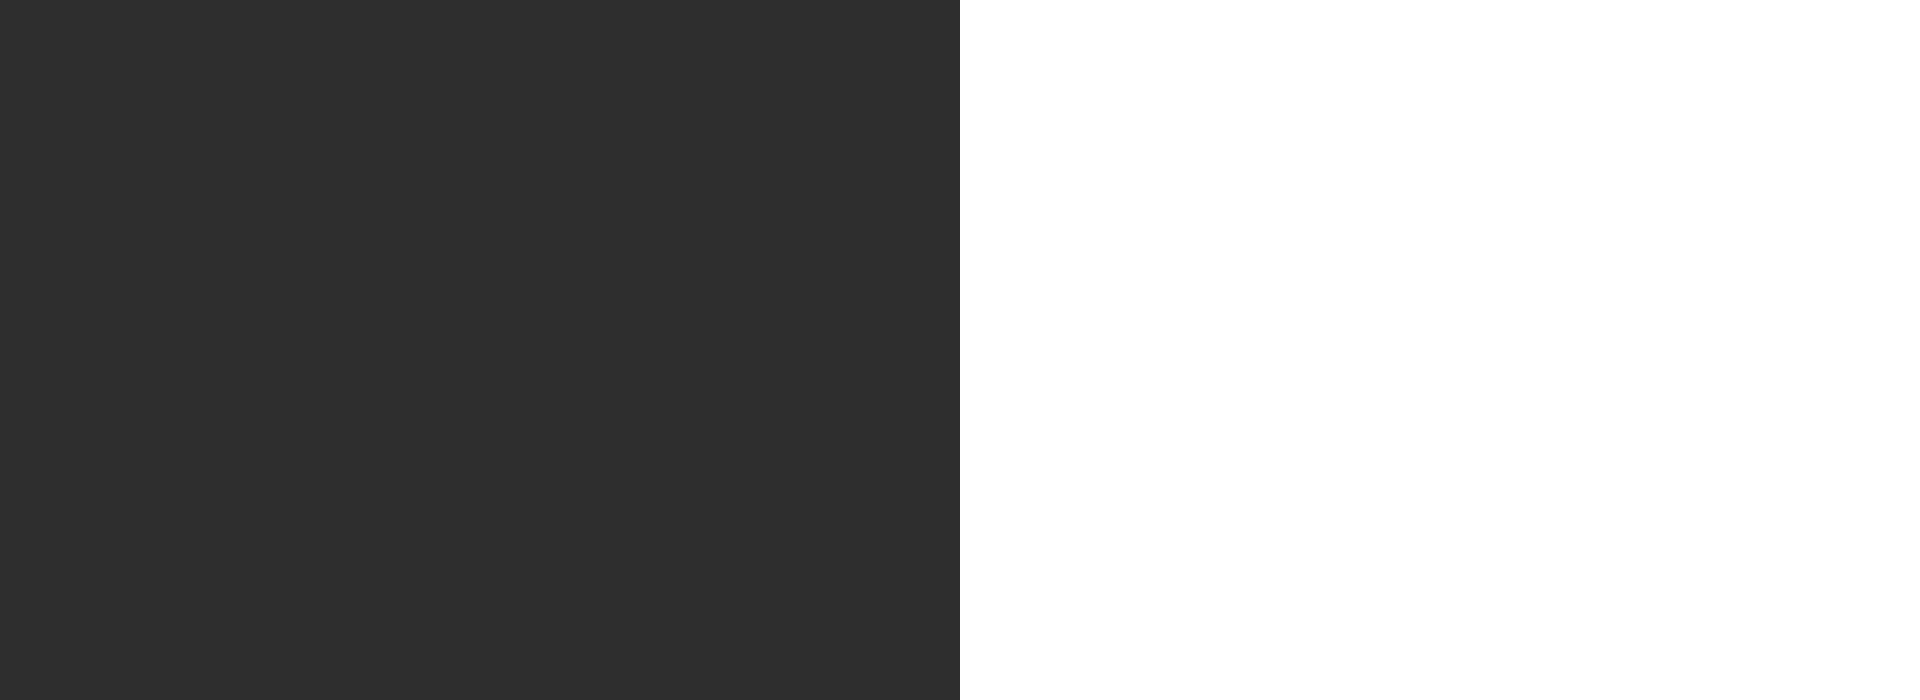 bg slide nero-bianco